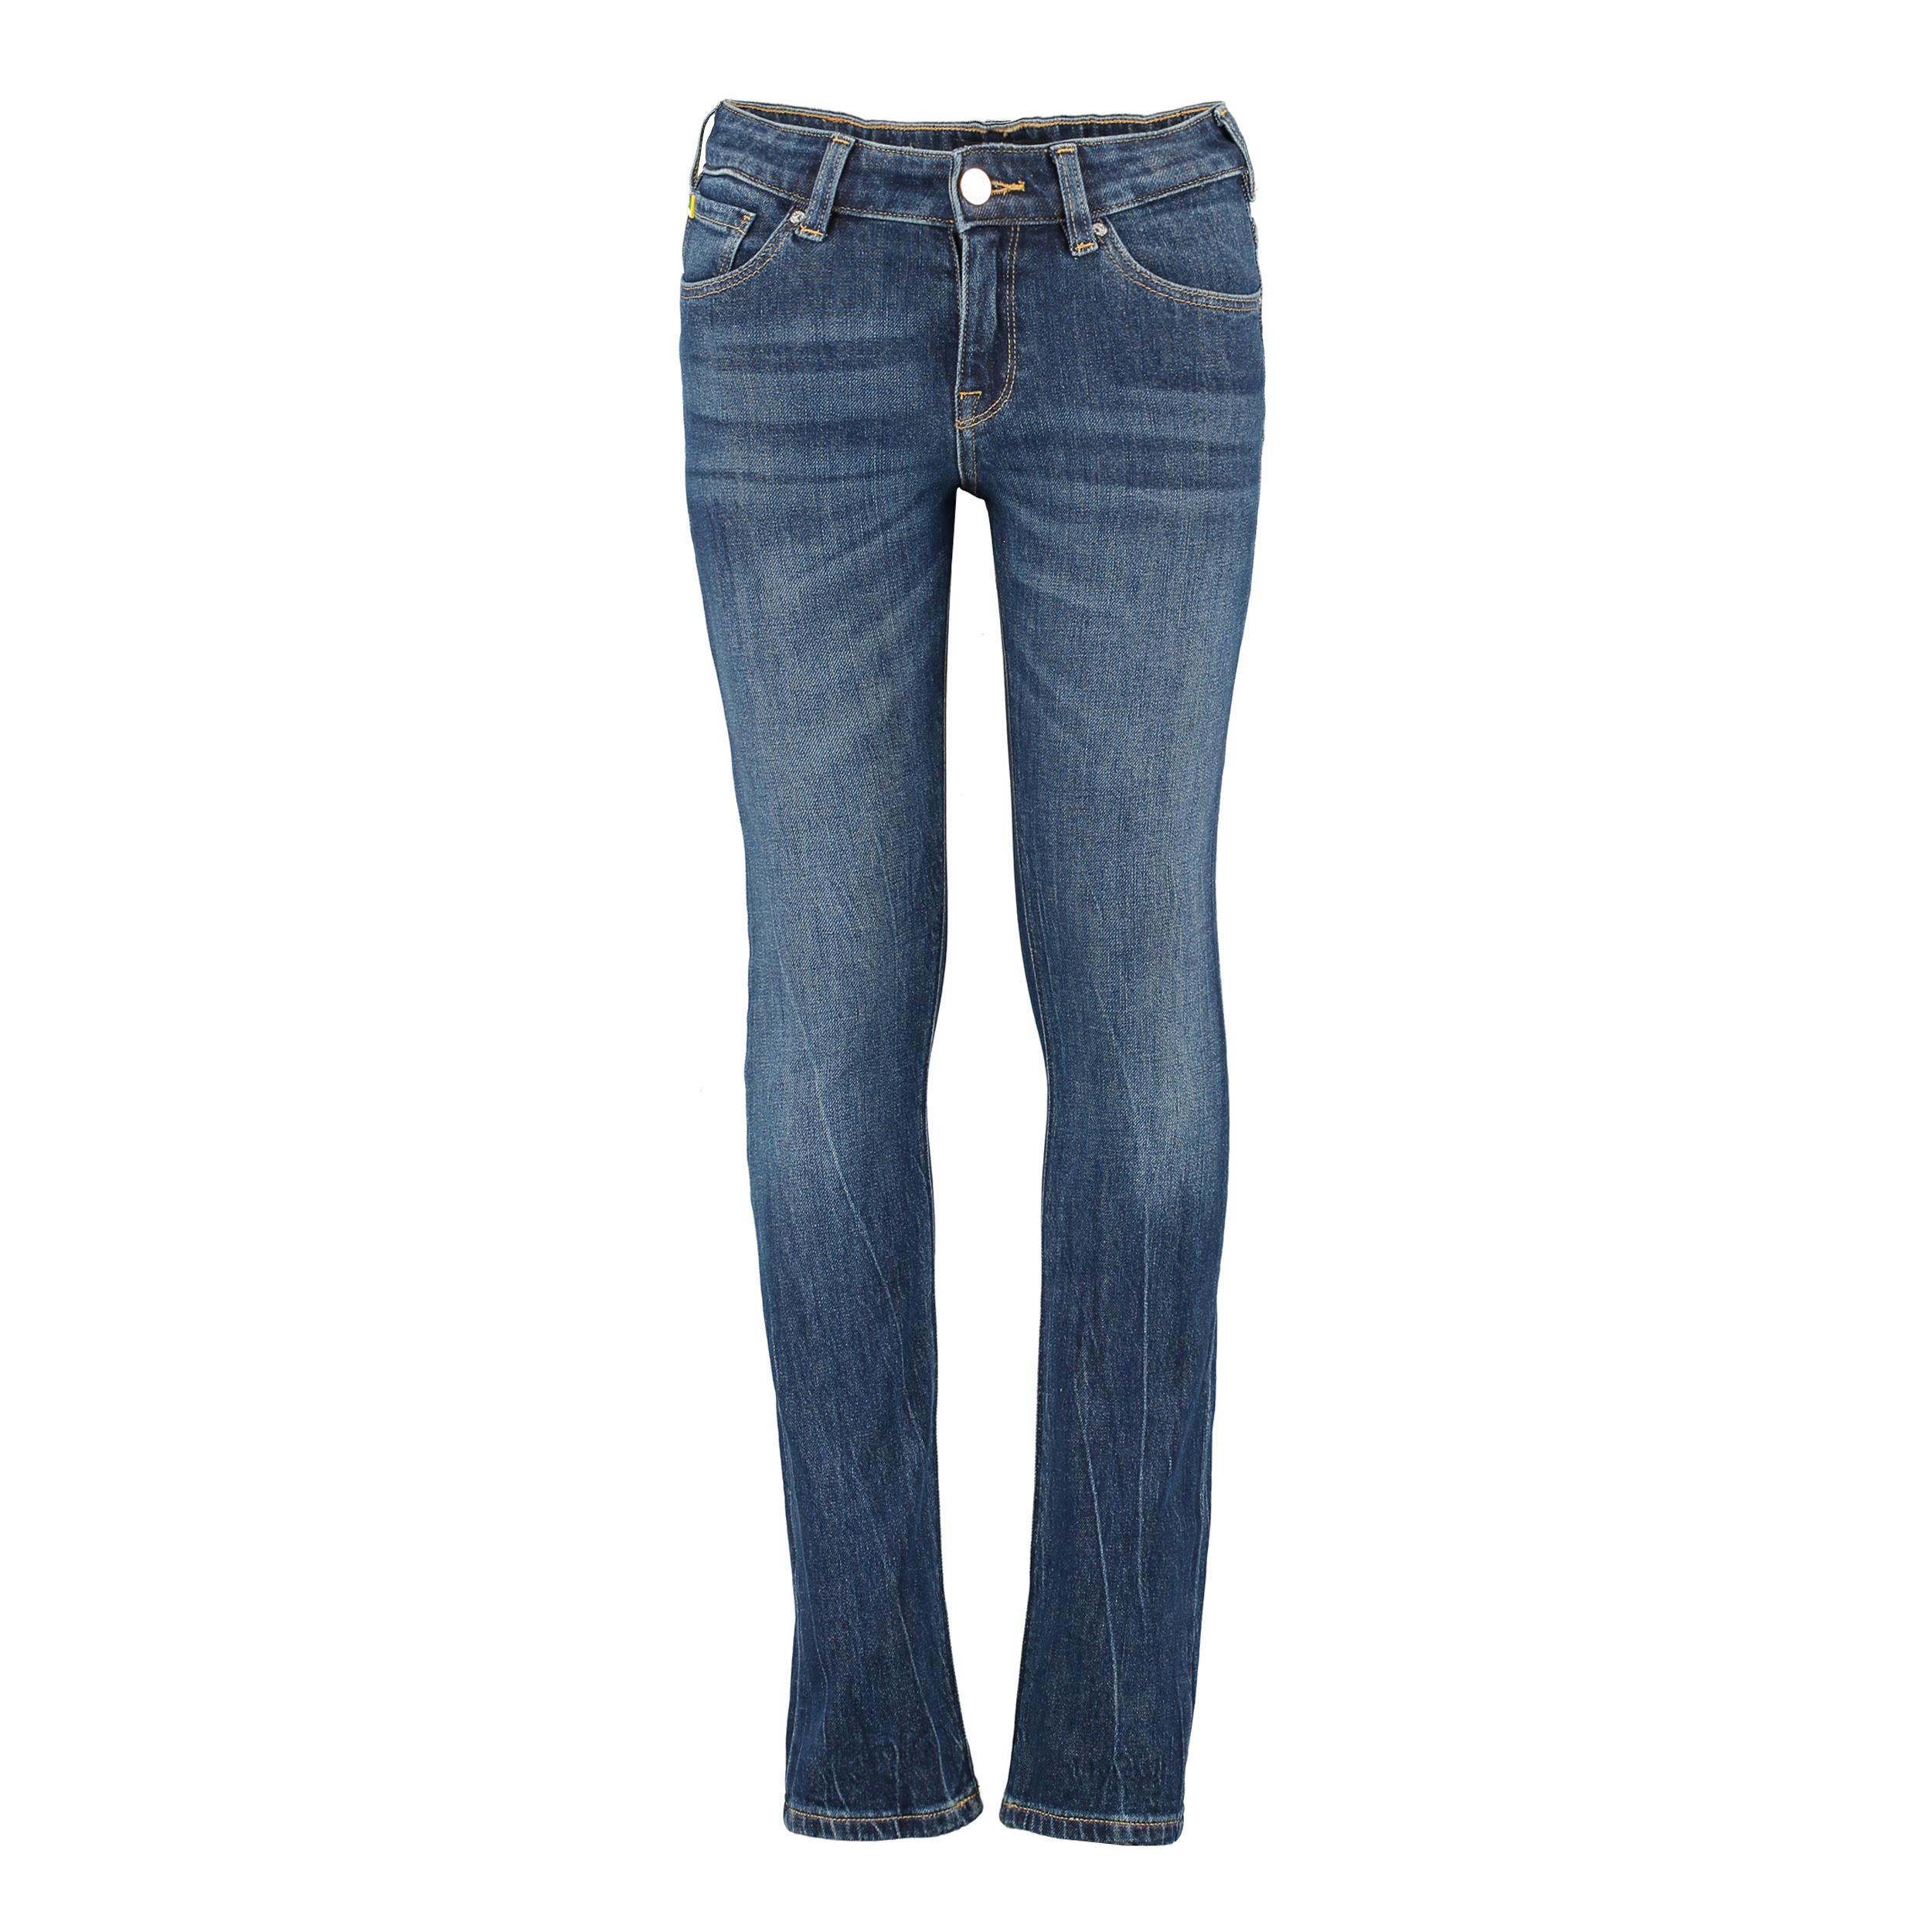 Scotch /& Soda Jungen Jeans Tigger